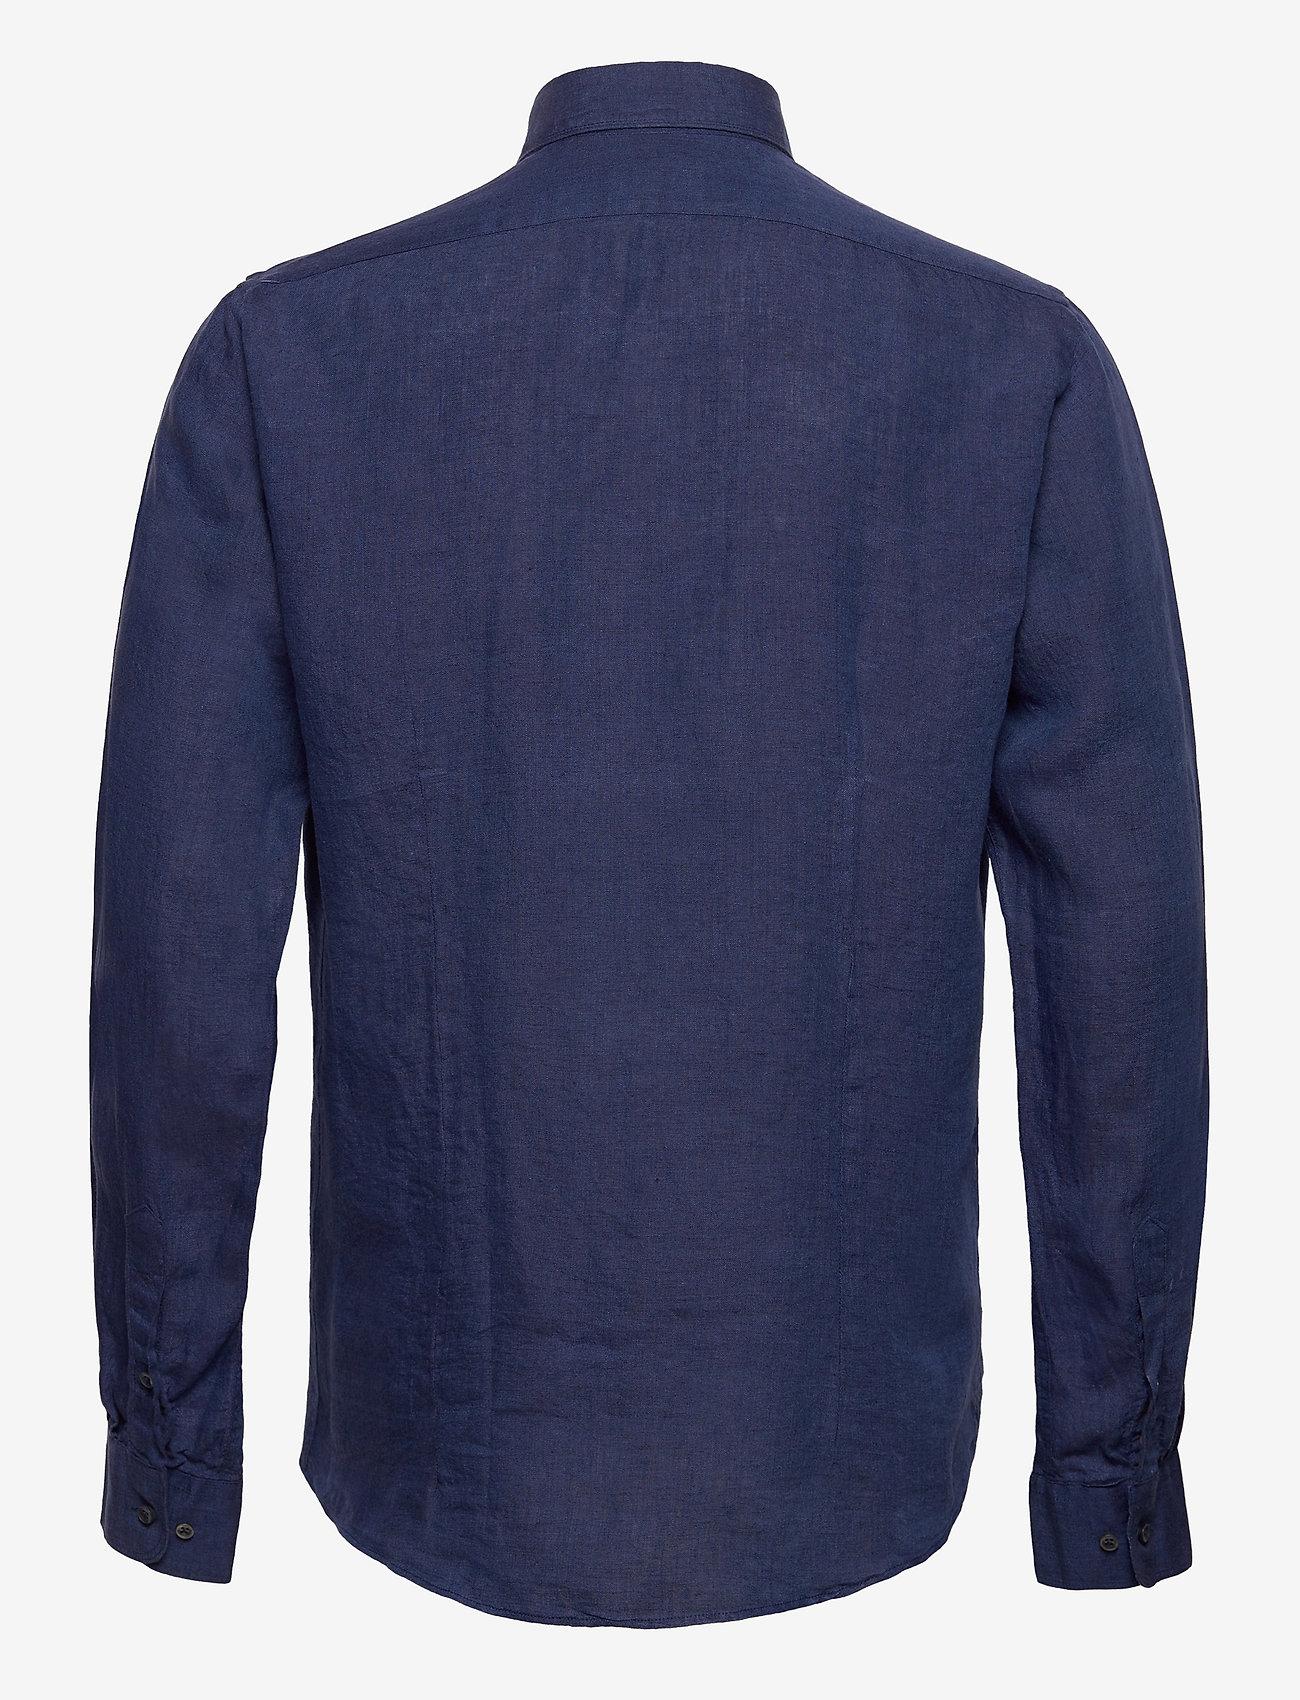 SAND - 8823 - State NC - basic skjortor - dark blue/navy - 1